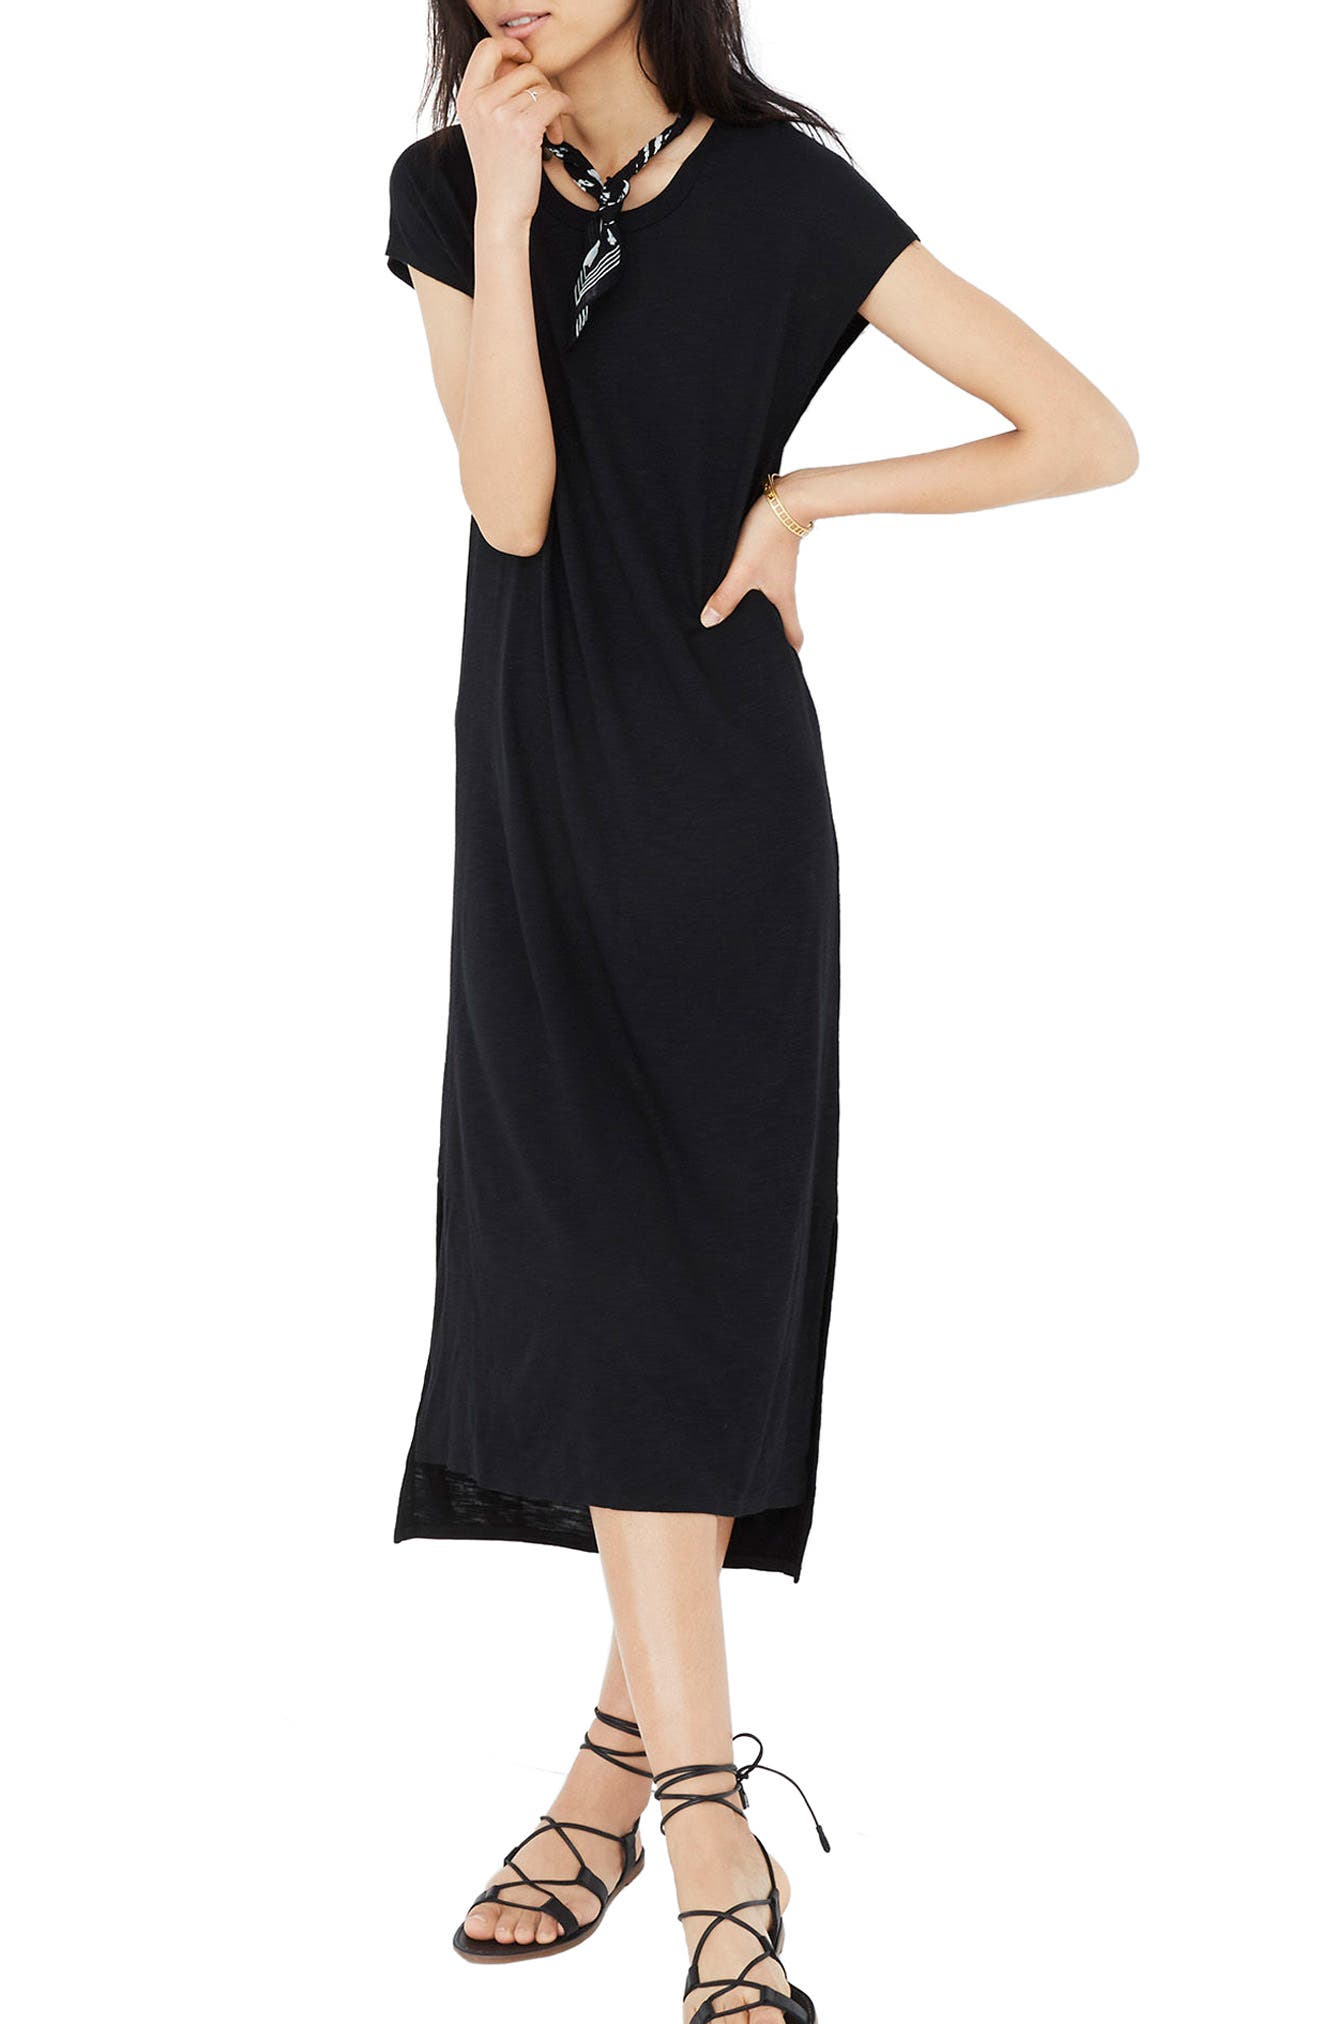 Black High Low Dresses